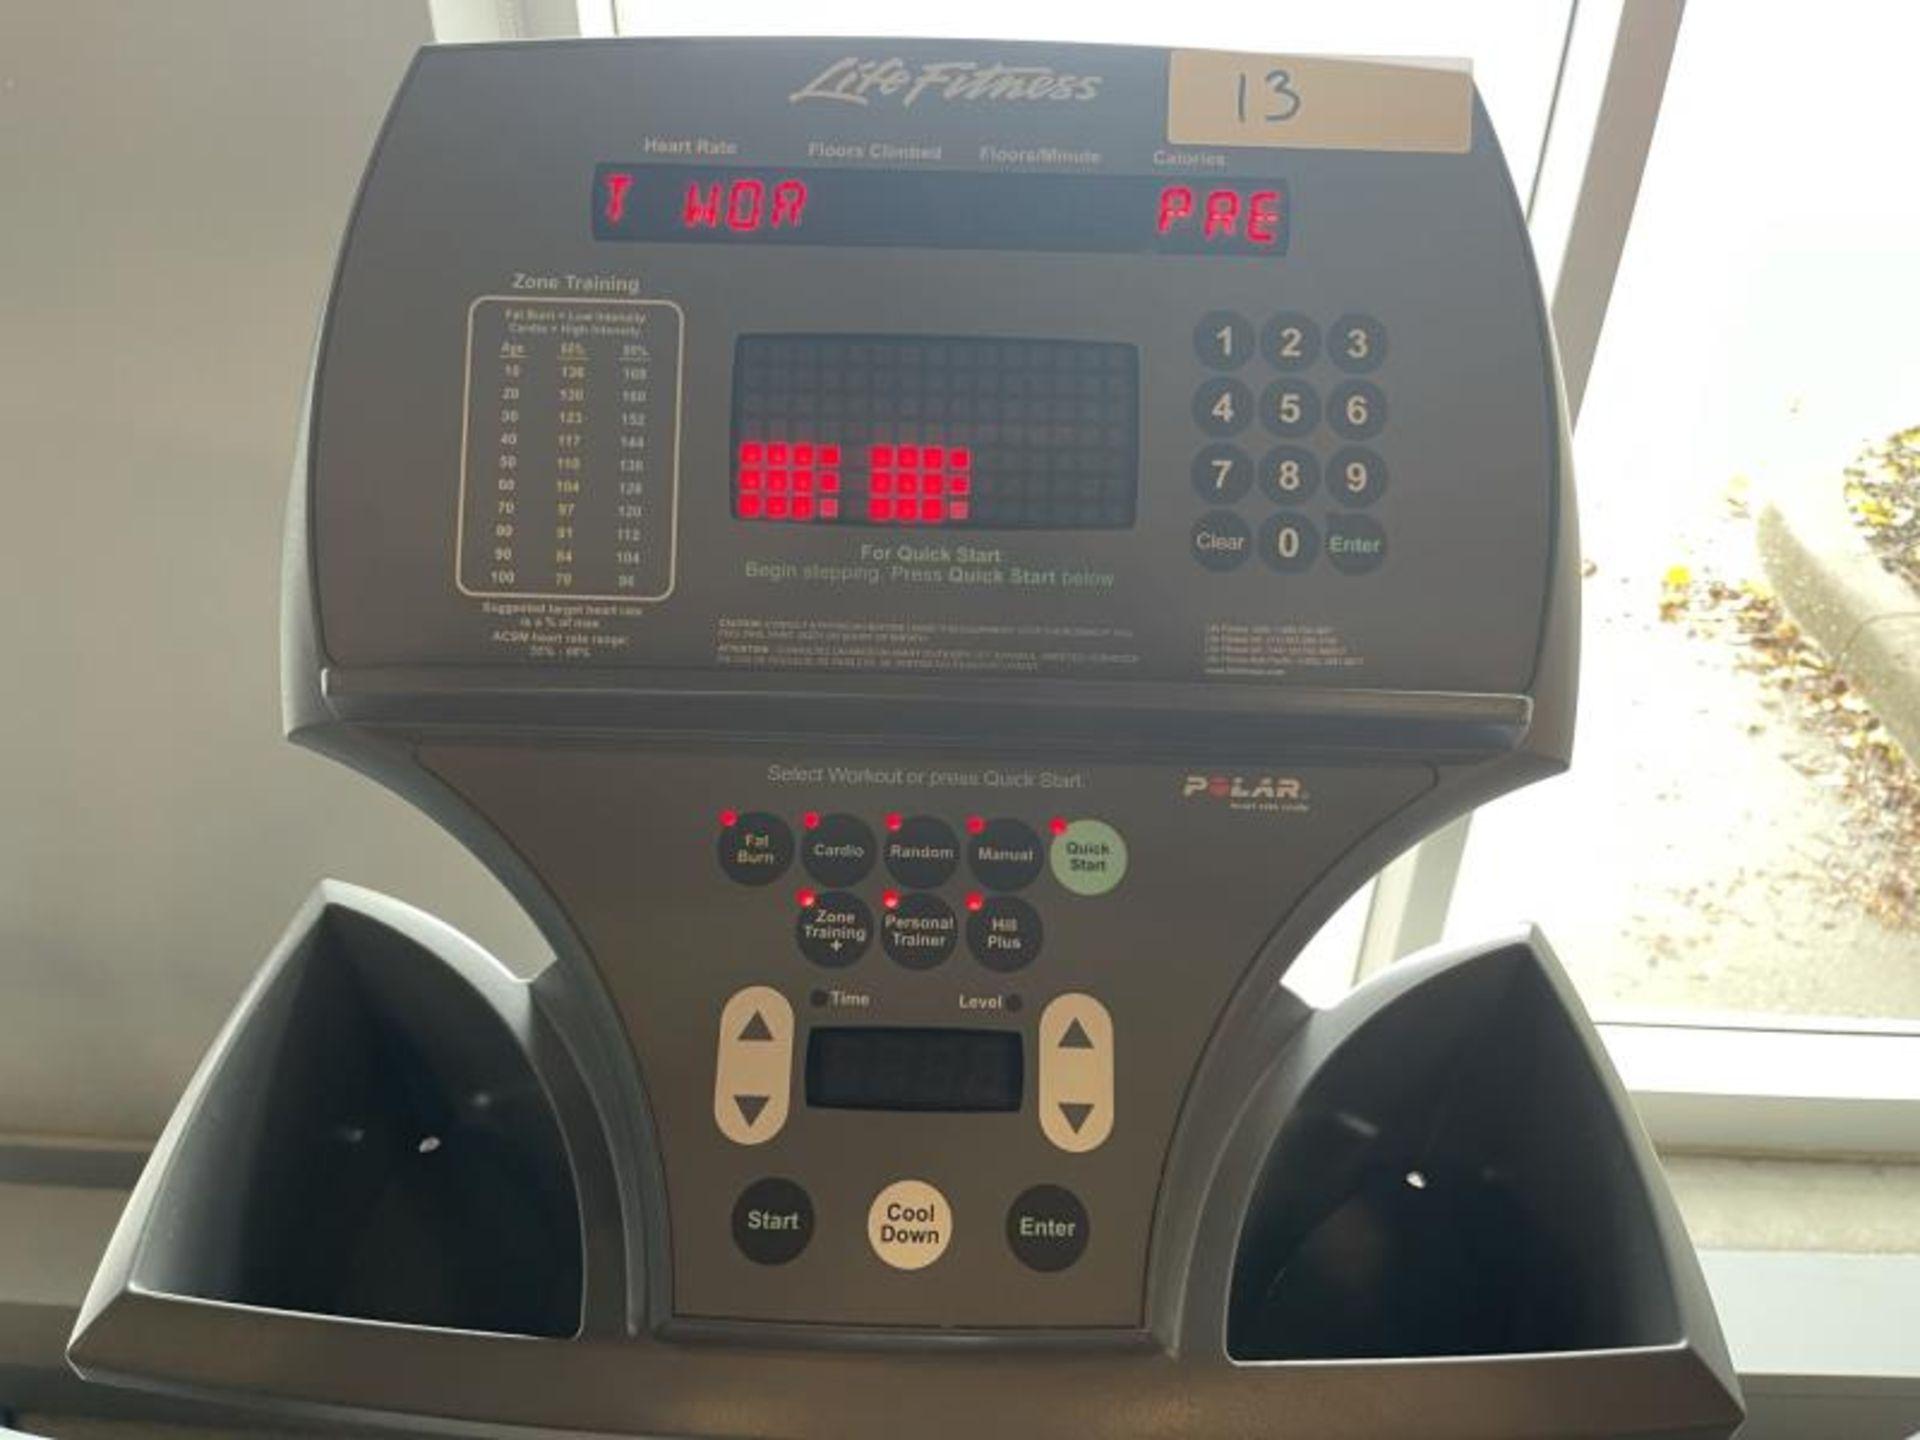 Life Fitness Stepper, M: 955 SN: MST105691 - Image 2 of 4